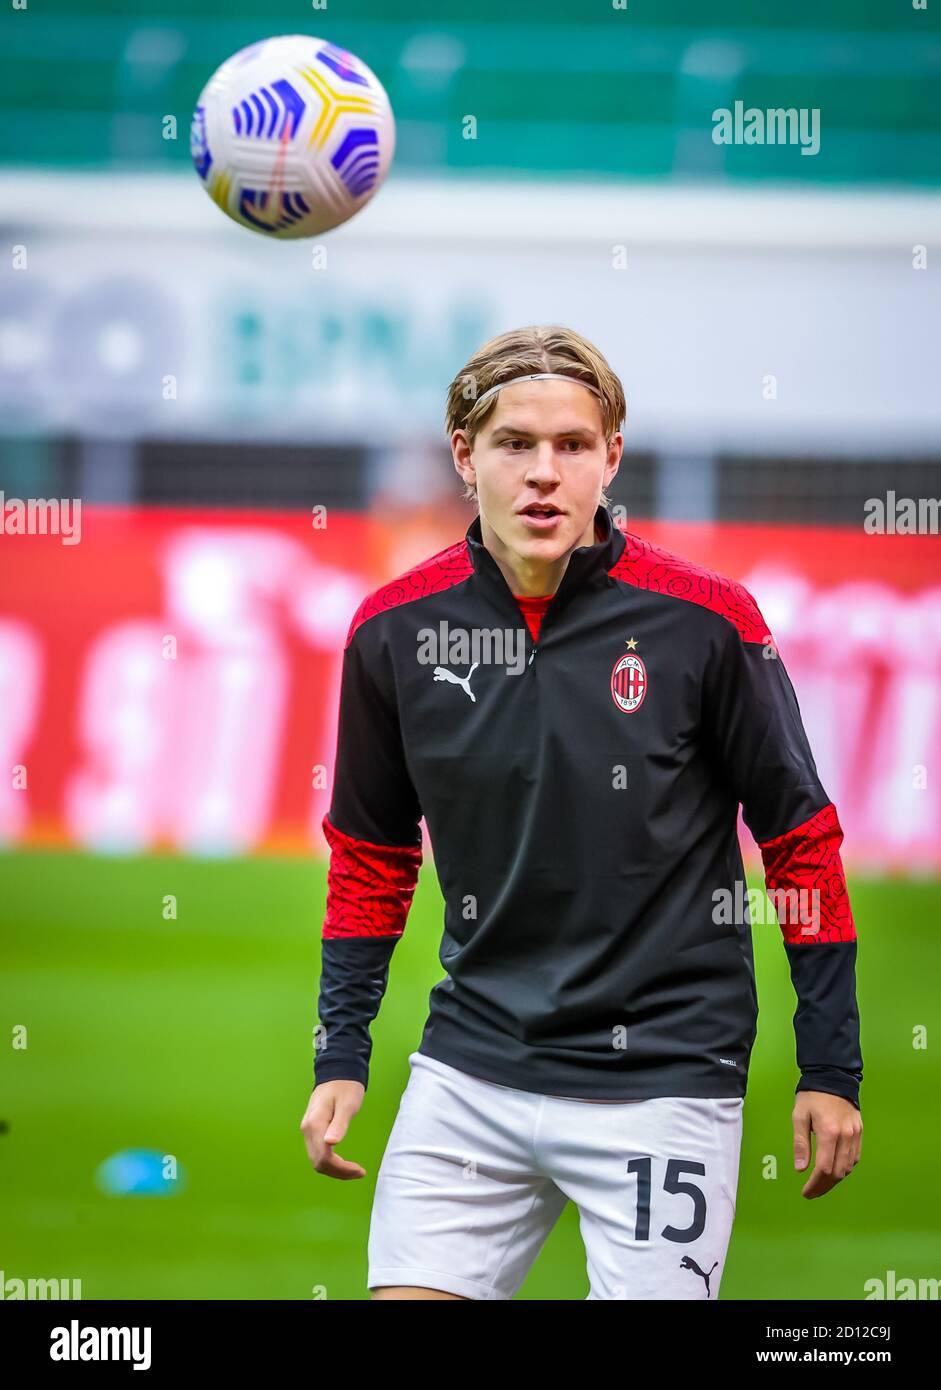 Jens Petter Hauge Of Ac Milan During The Serie A 2020 21 Match Between Ac Milan